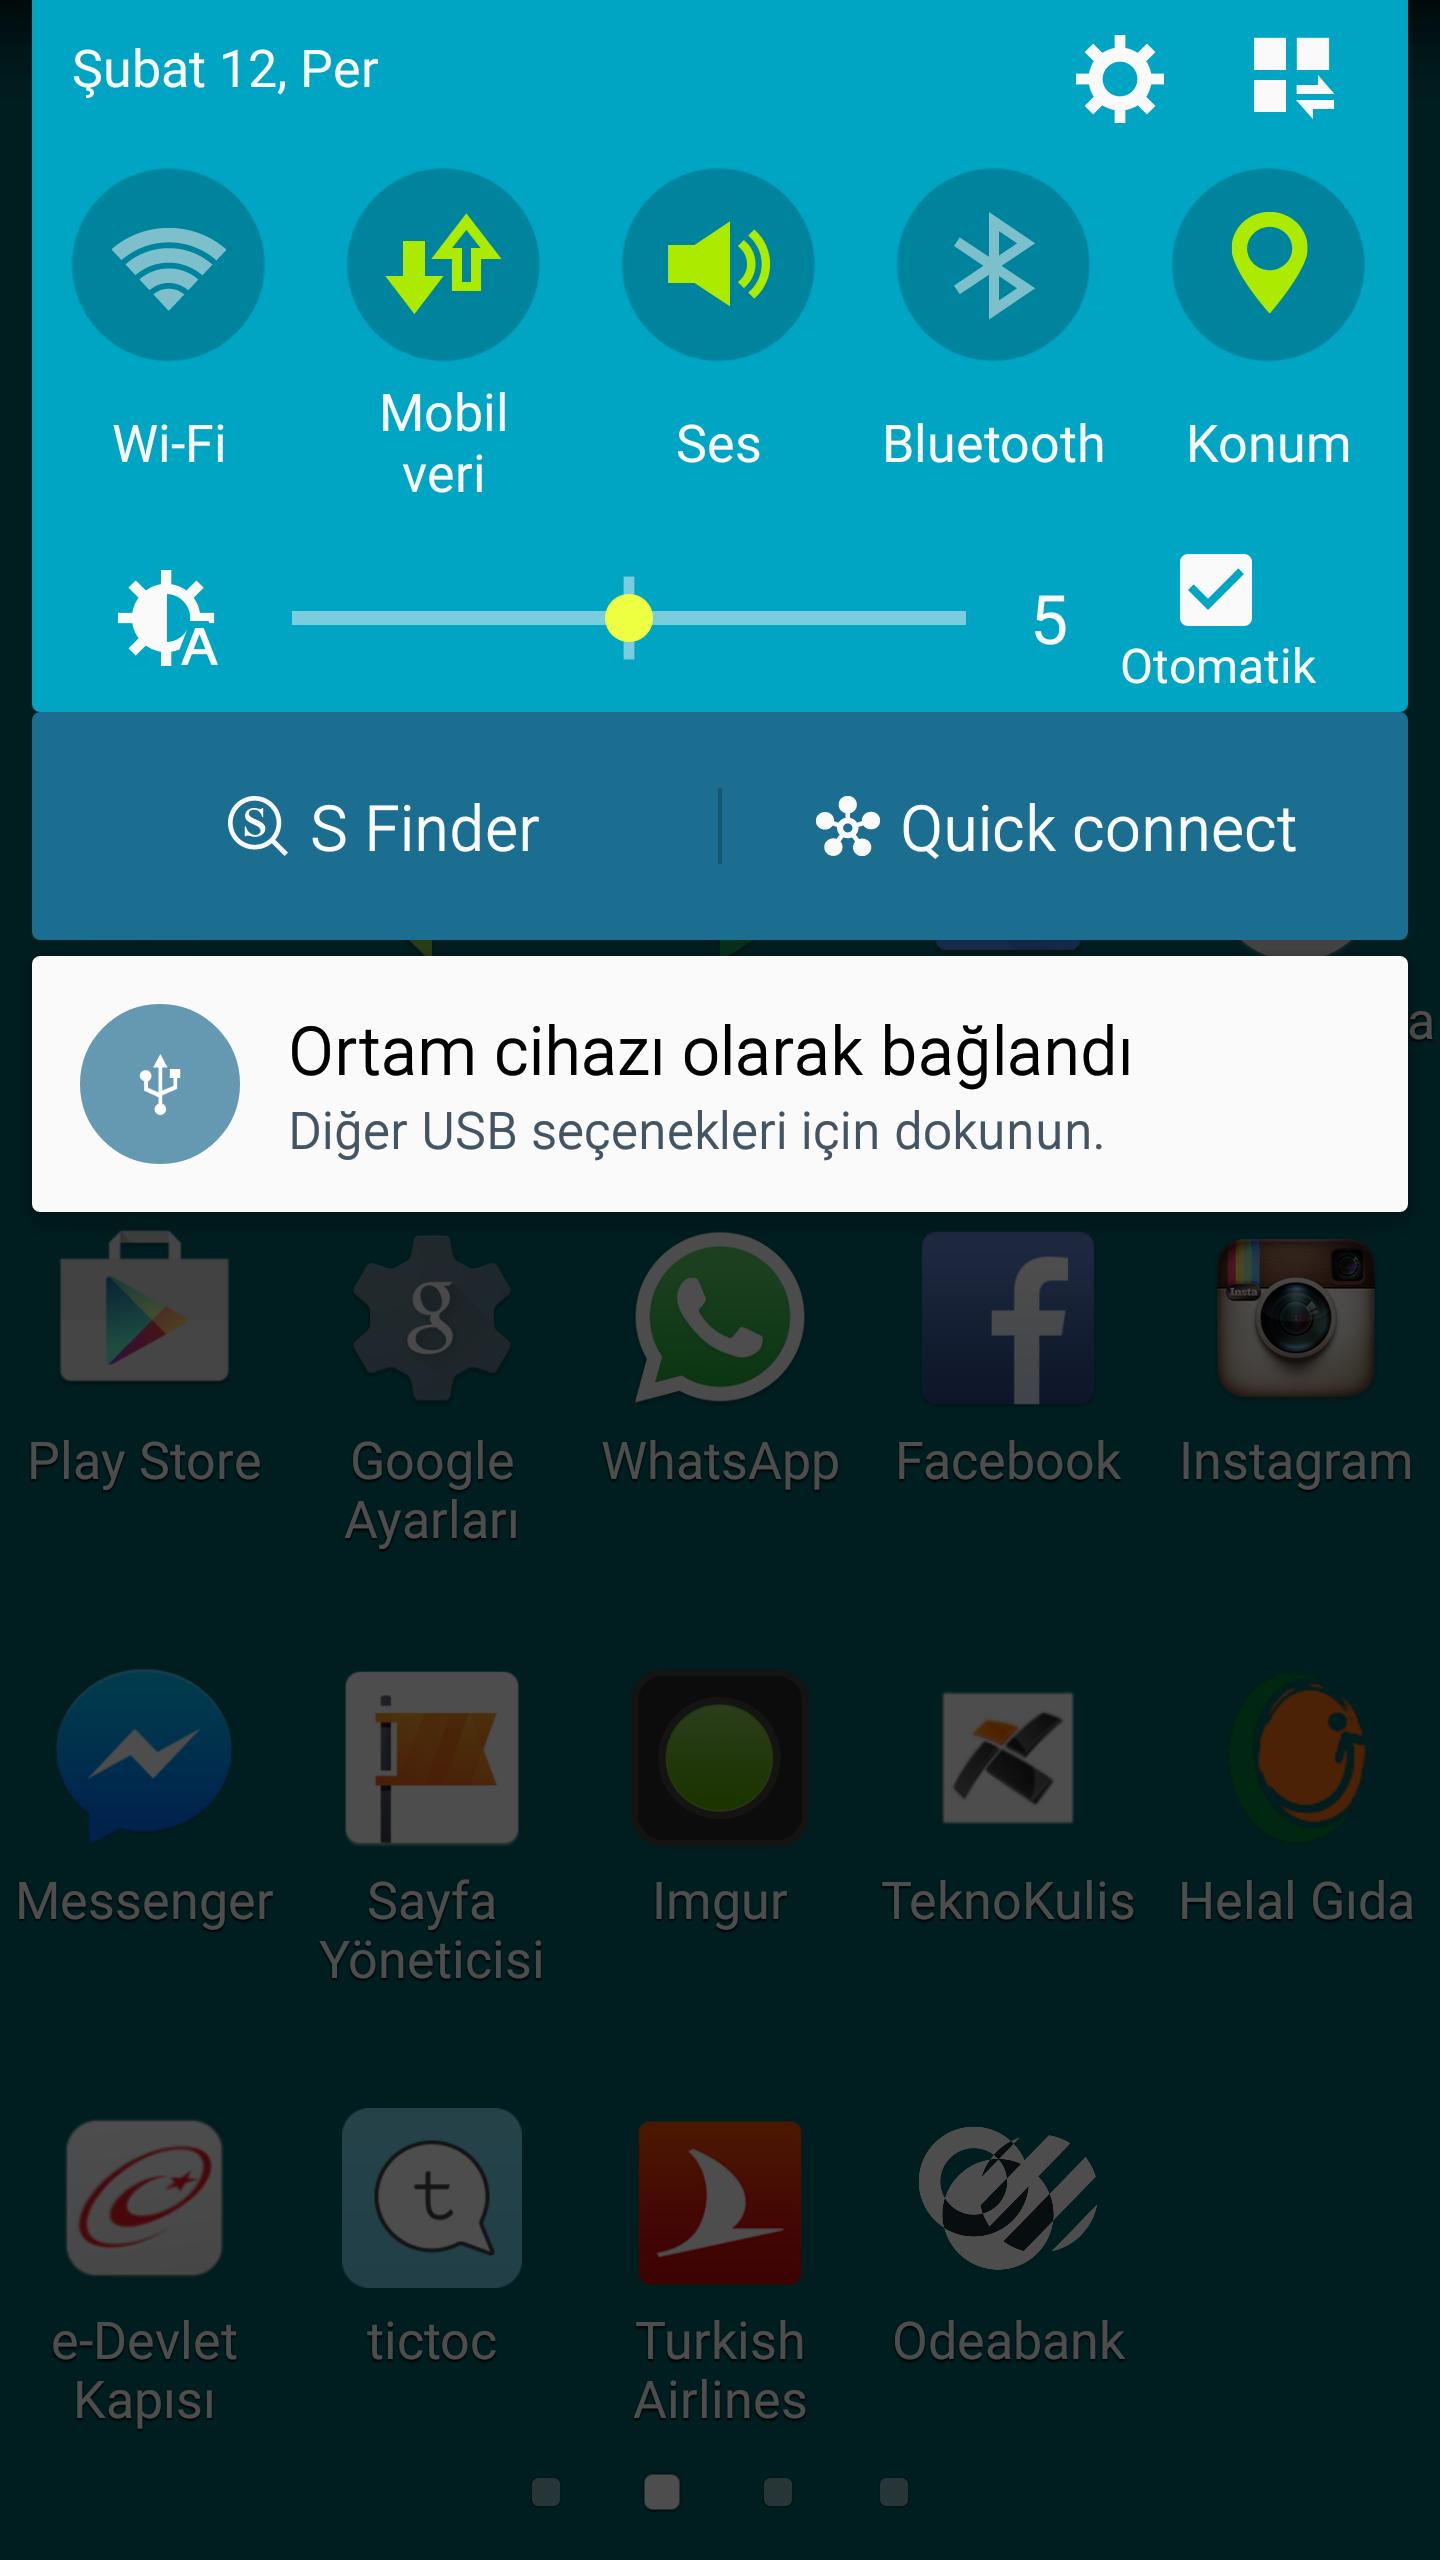 SAMSUNG WAVE II BOŞ ARAMA KAYDI SORUNU